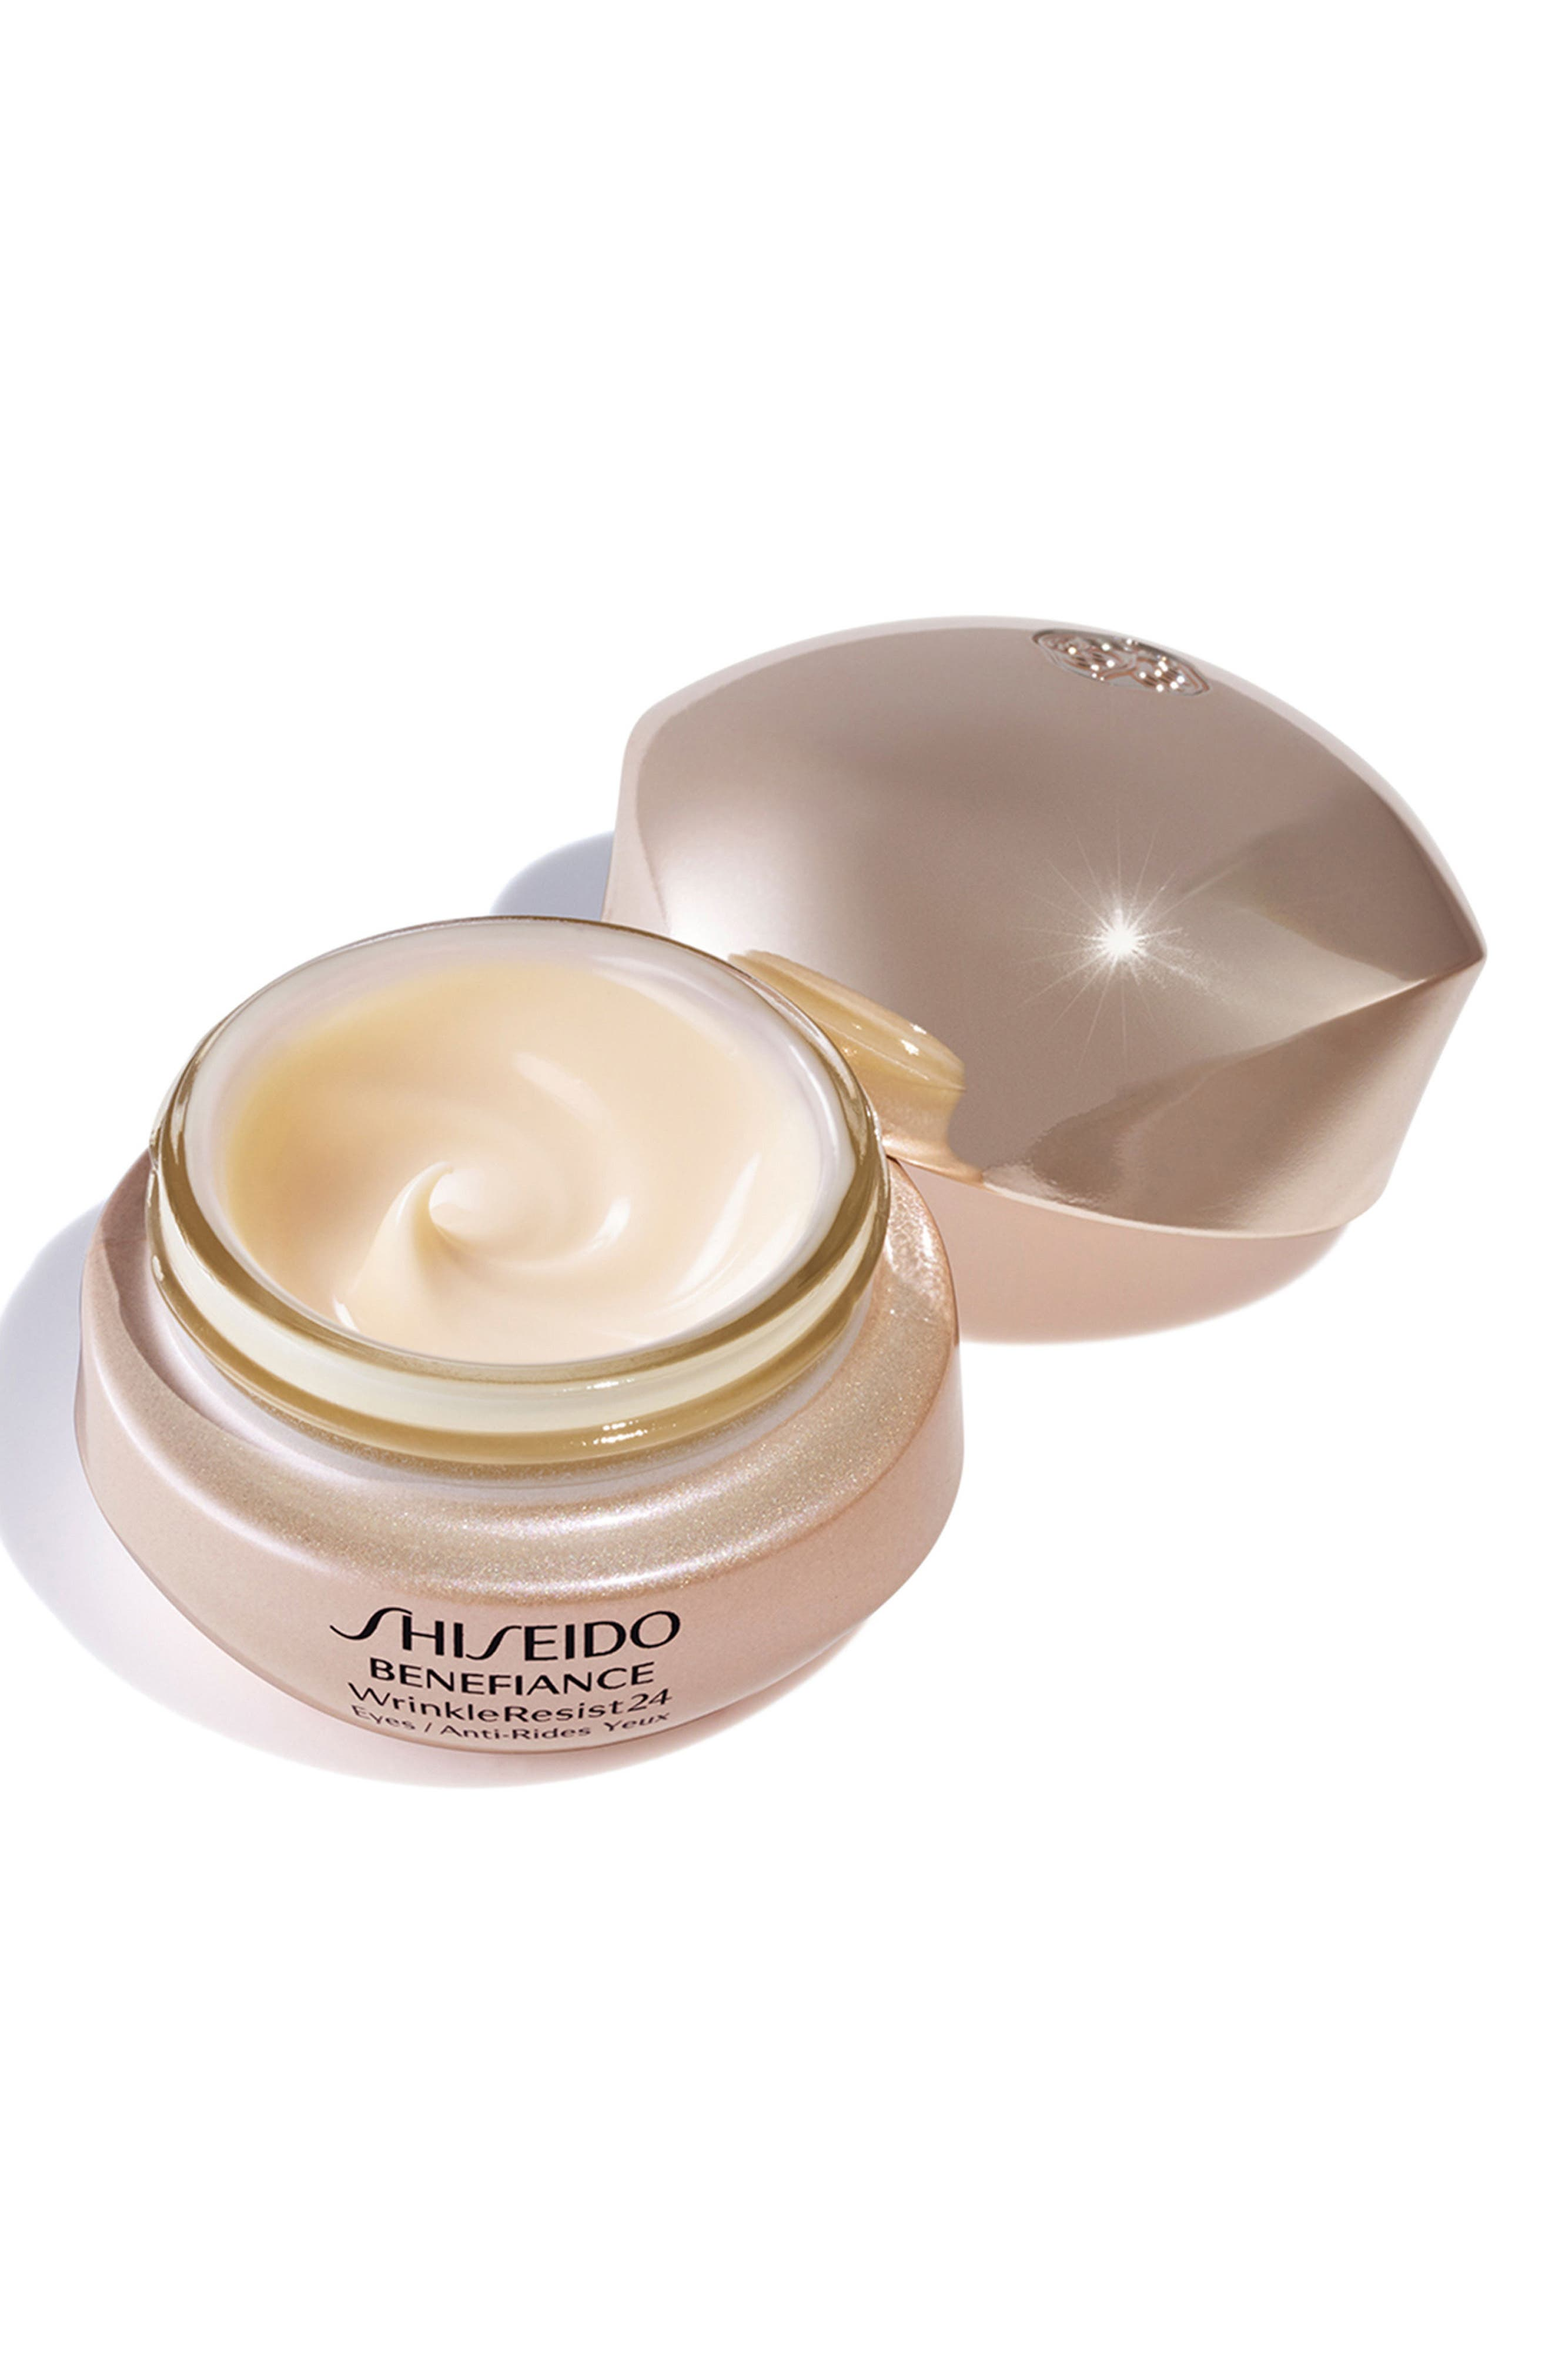 SHISEIDO, Benefiance WrinkleResist24 Intensive Eye Contour Cream, Alternate thumbnail 3, color, NO COLOR